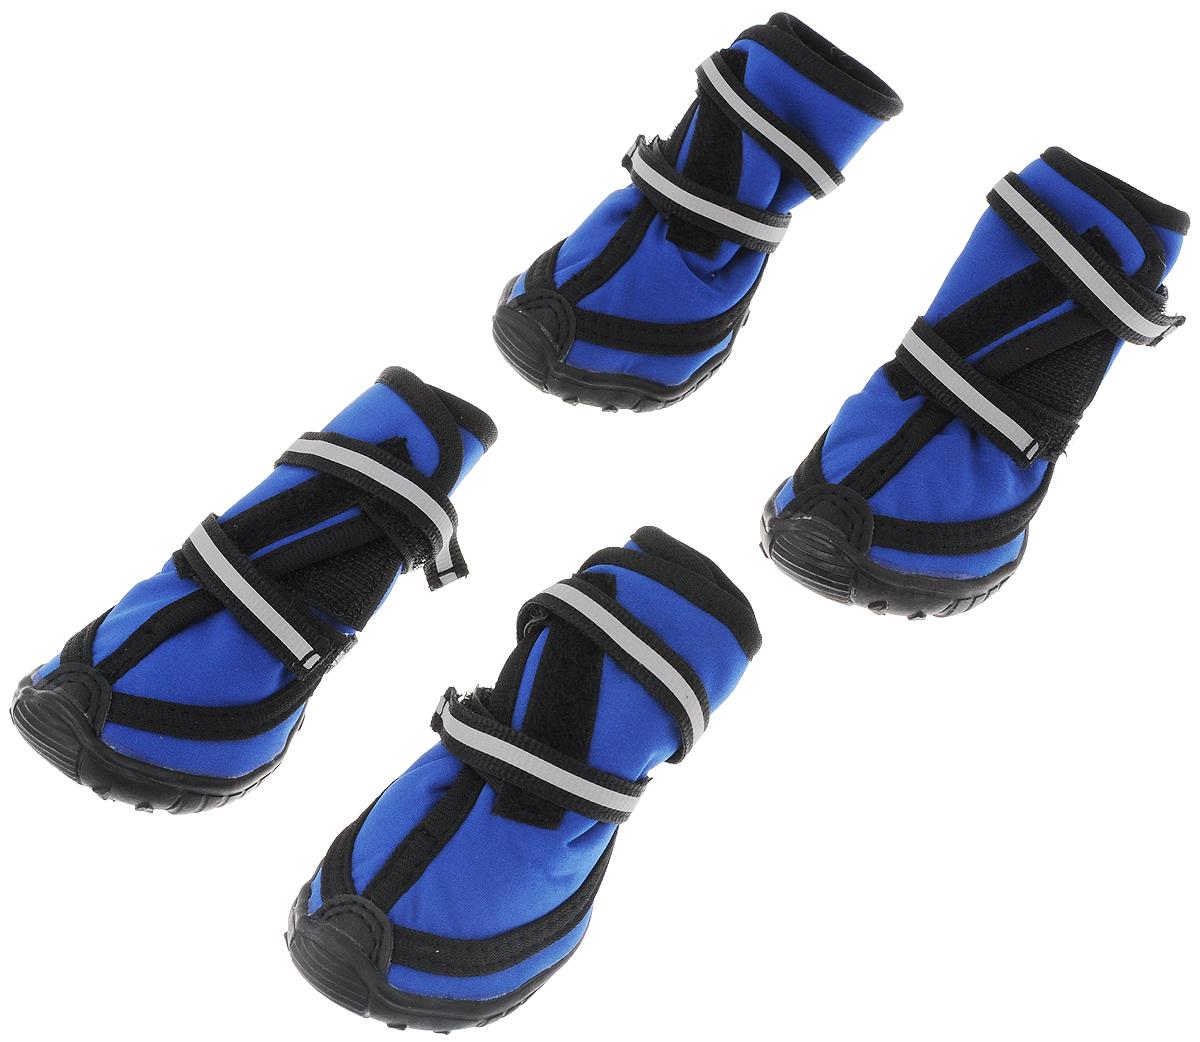 Сапоги для собак Triol, унисекс, цвет: черный, синий. Размер XS сапоги monaco low